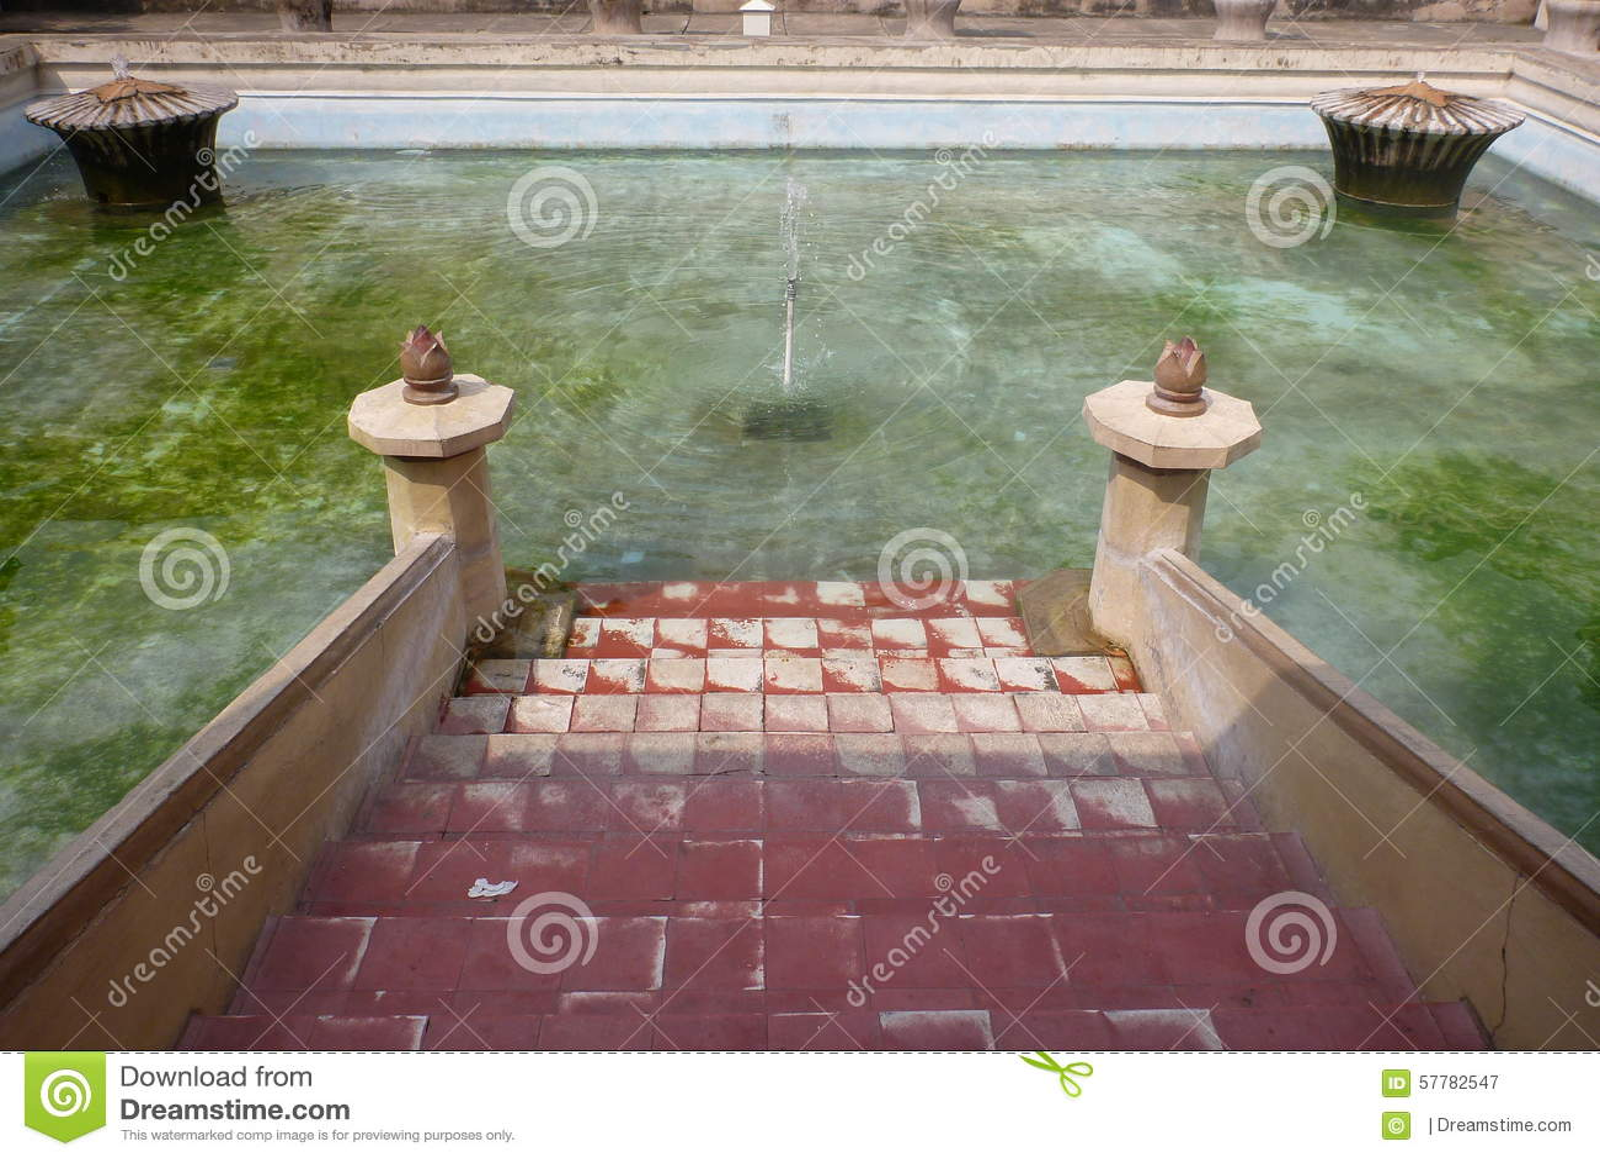 Taman sari s royal bath room